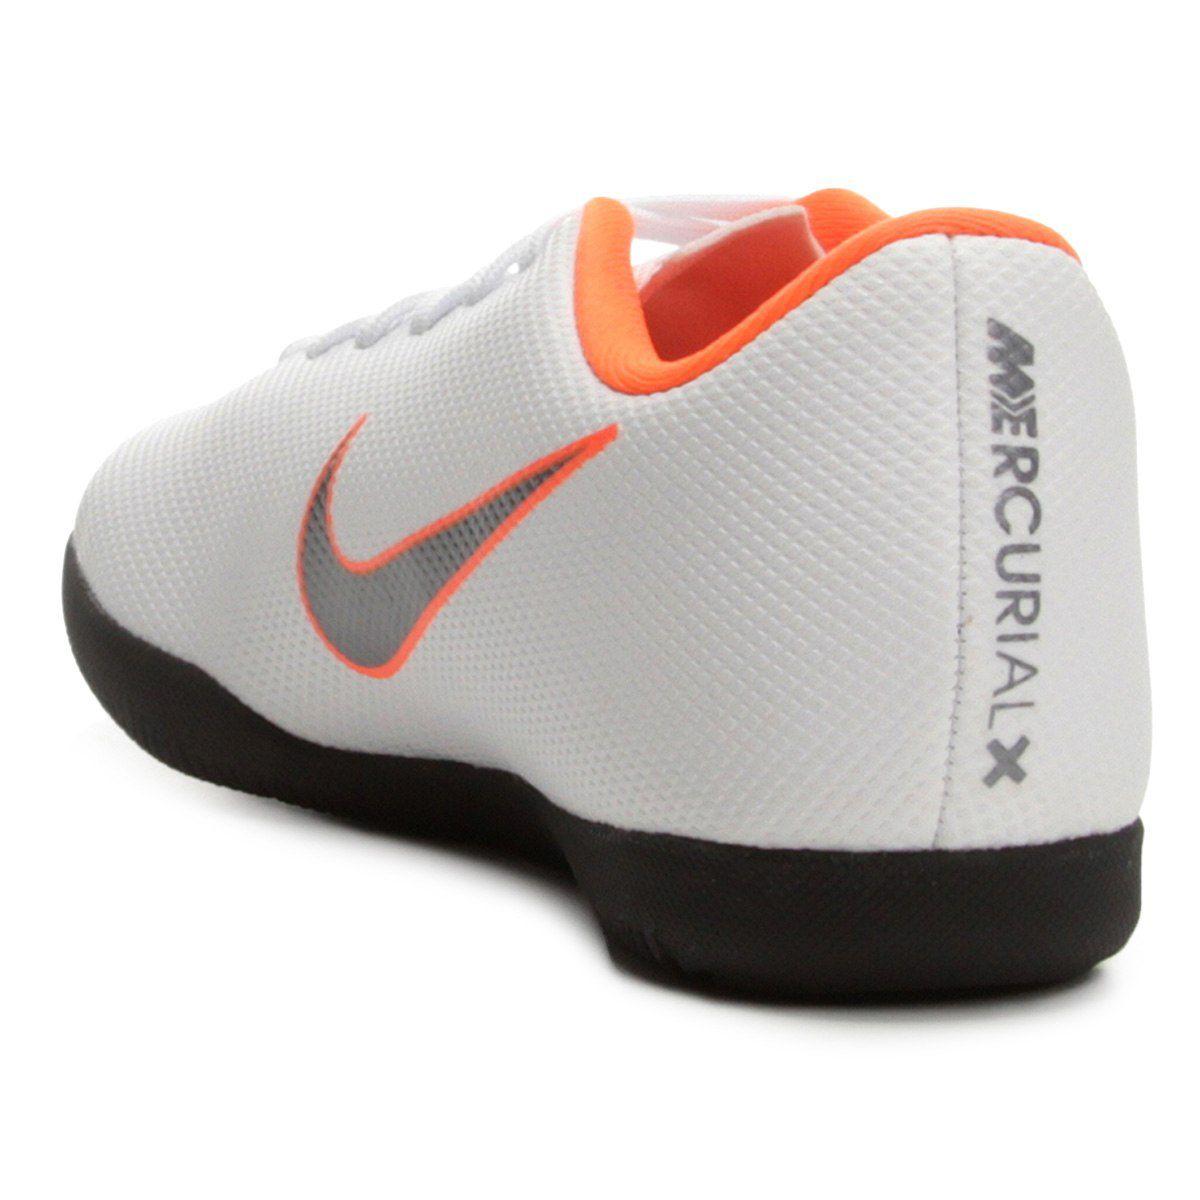 79b43ffba7 Chuteira Futsal Nike Mercurial Vaporx 12 Club - Titanes Esportes